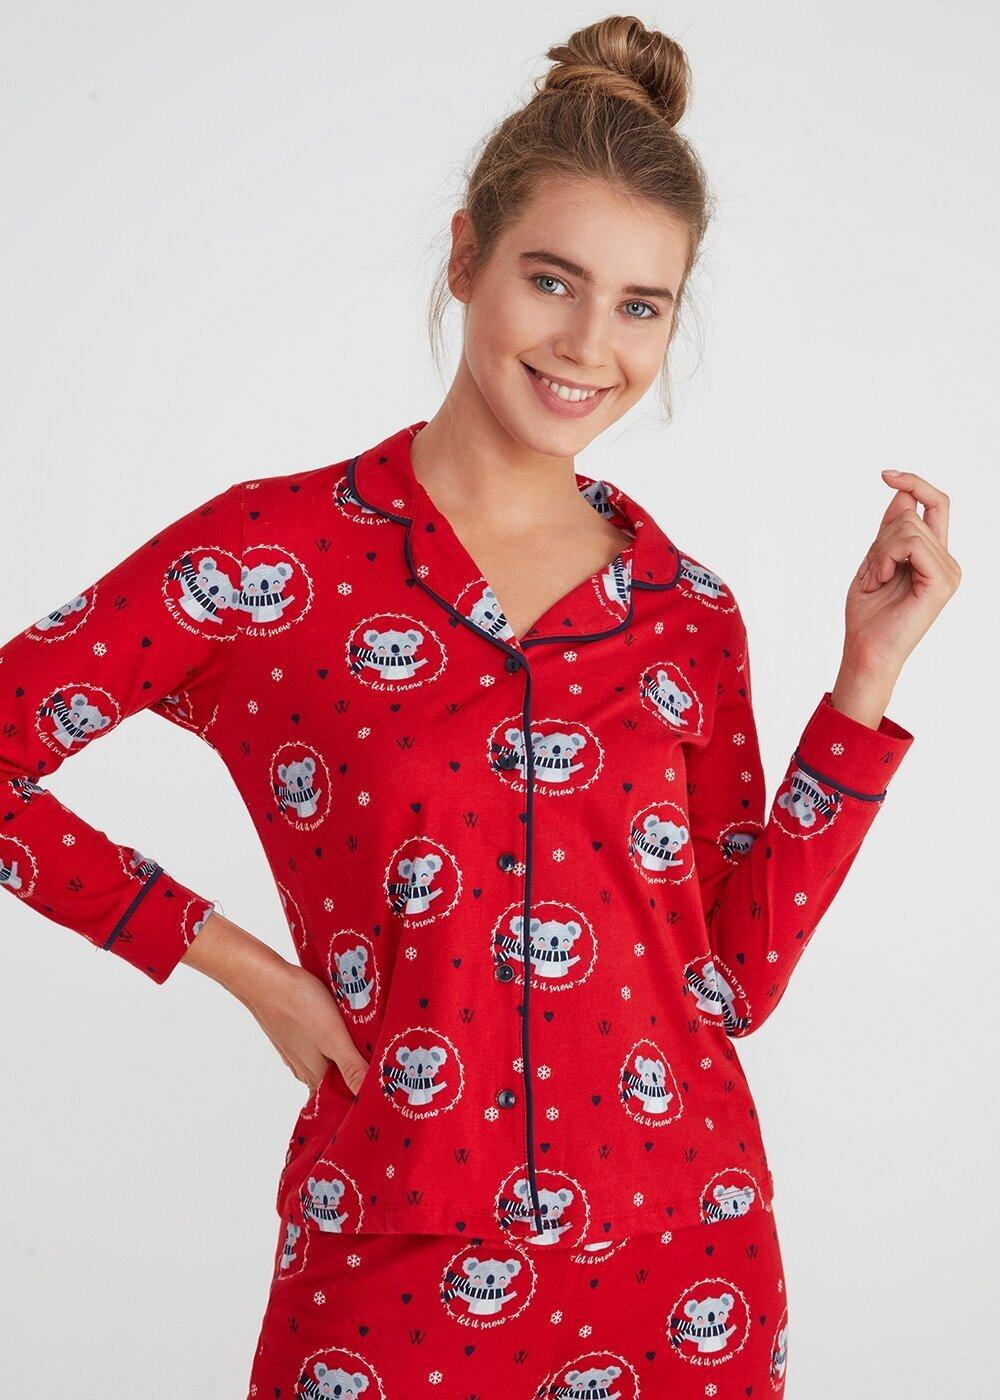 resm Koalina Maskulen Pijama Takımı - KIRMIZI BASKILI